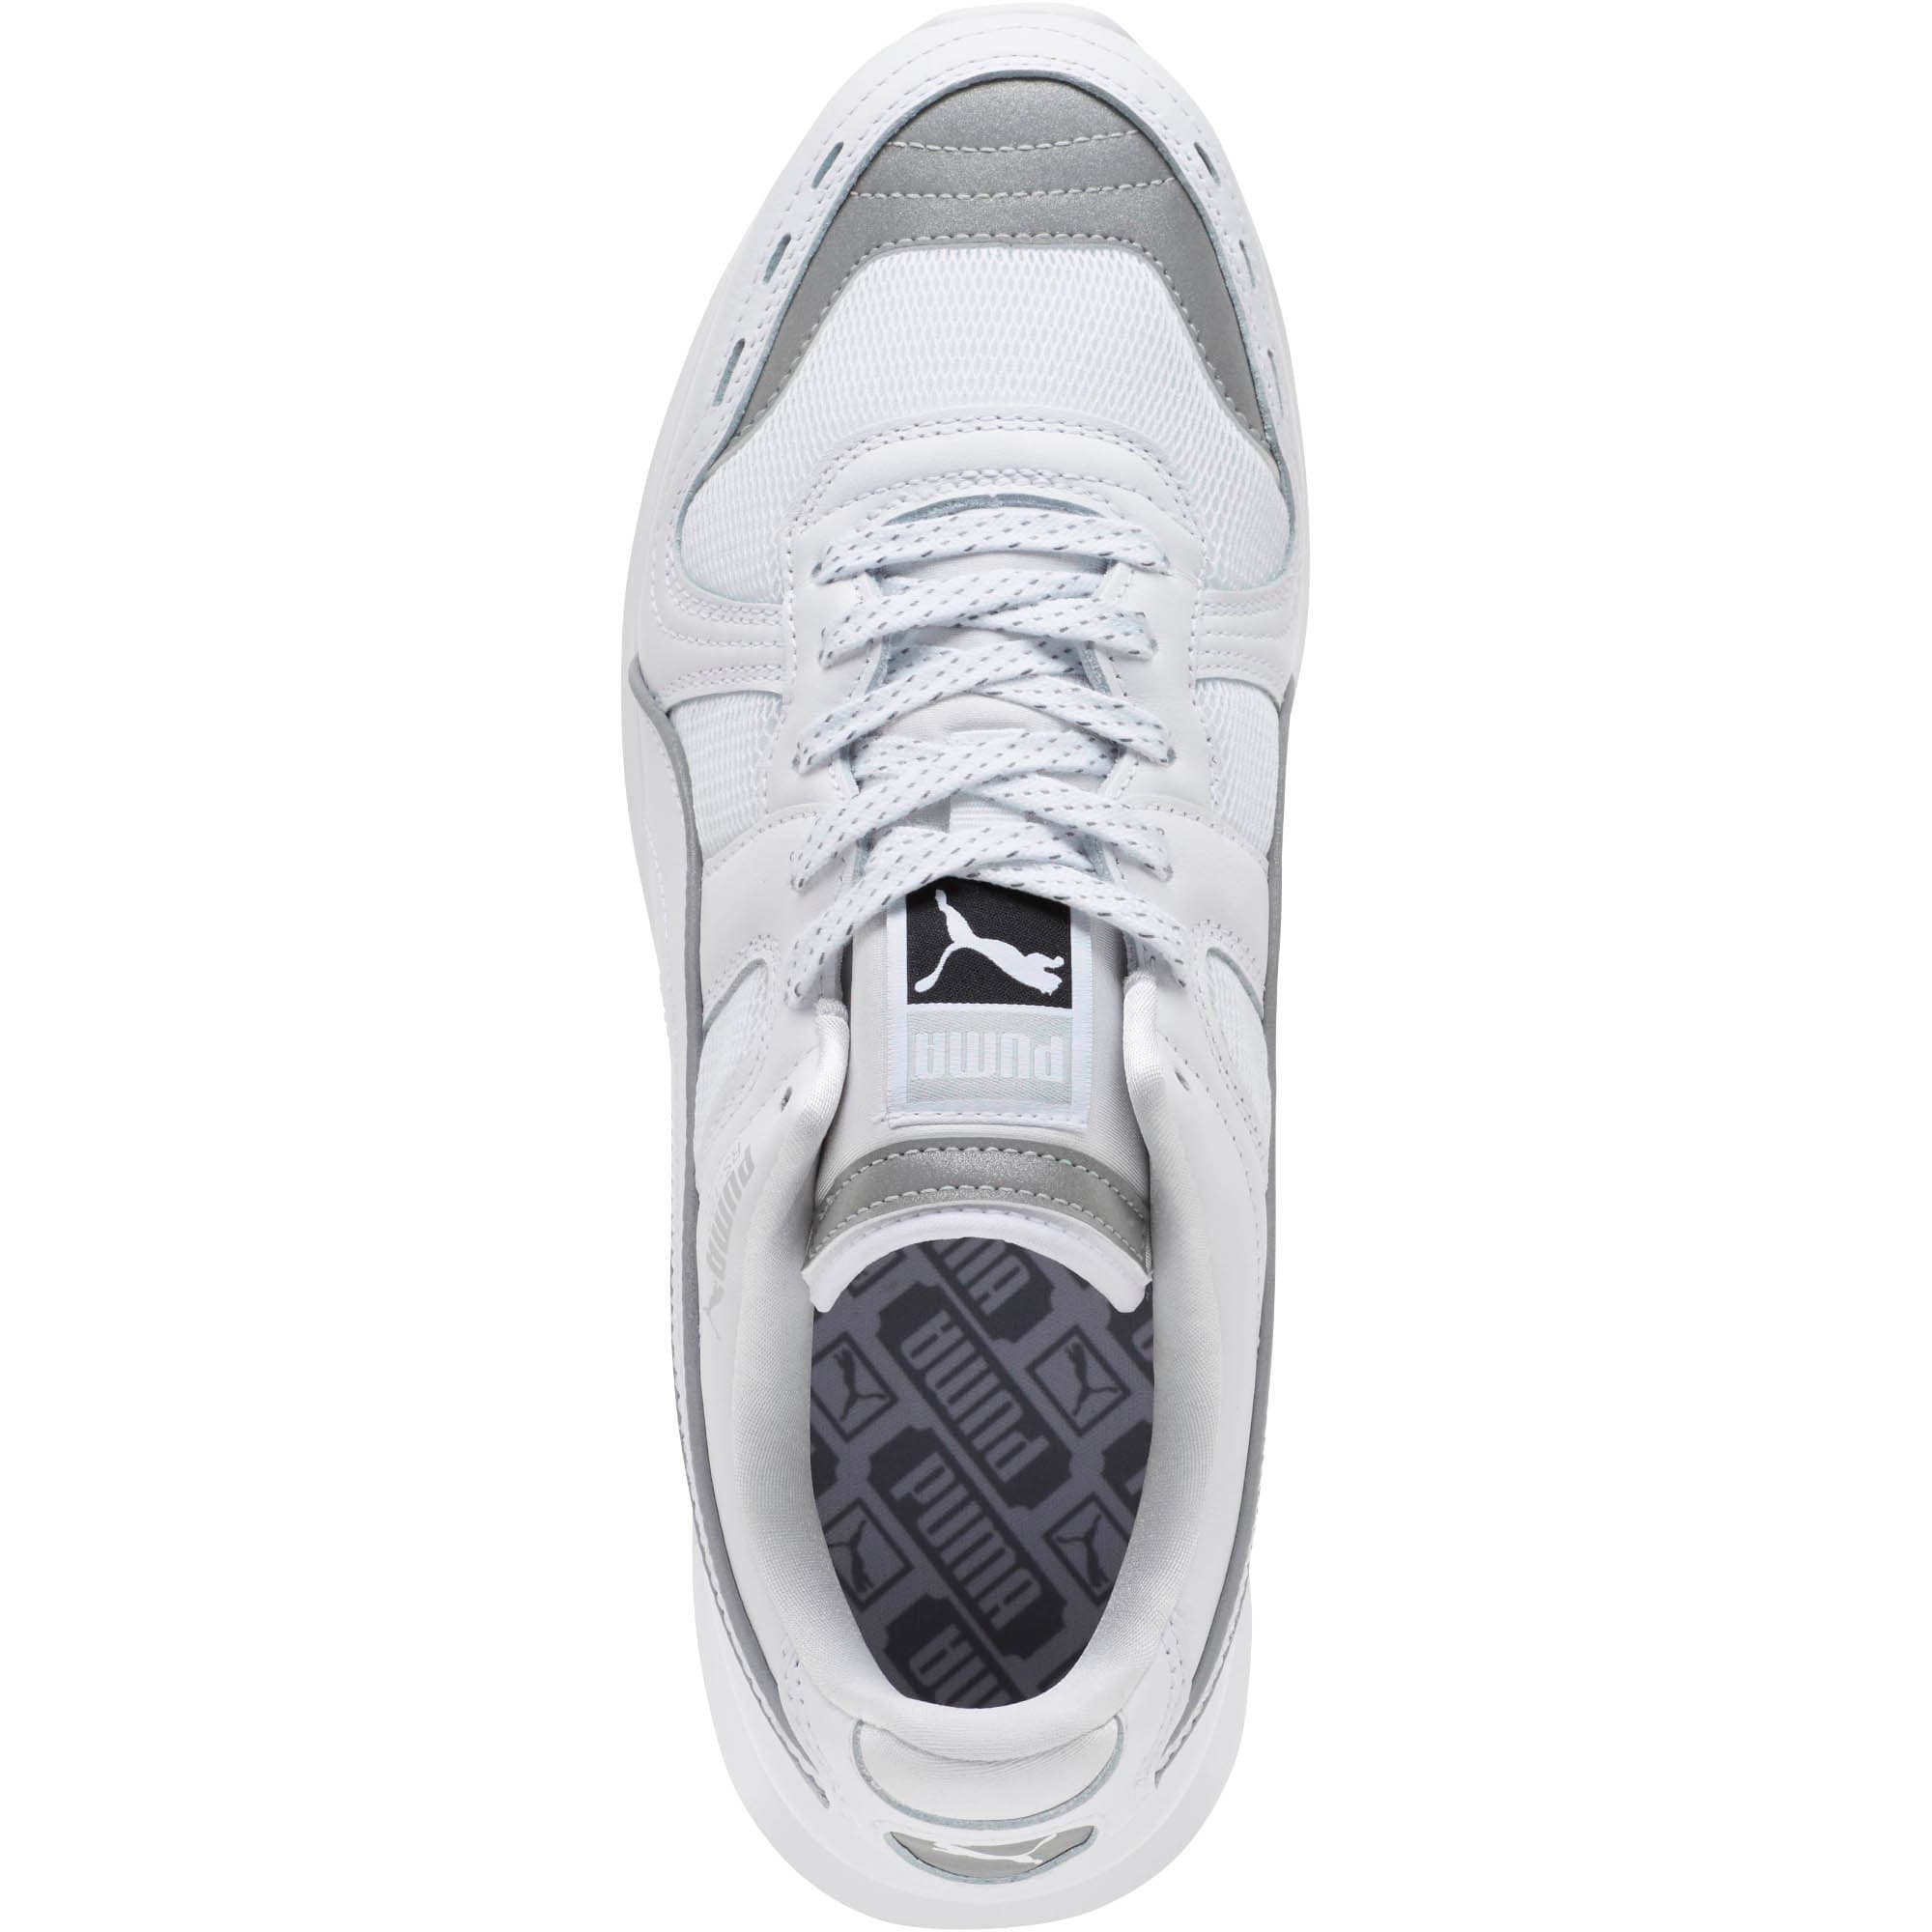 Thumbnail 5 of RS-100 Optic Men's Sneakers, P White-P Silver-Puma White, medium